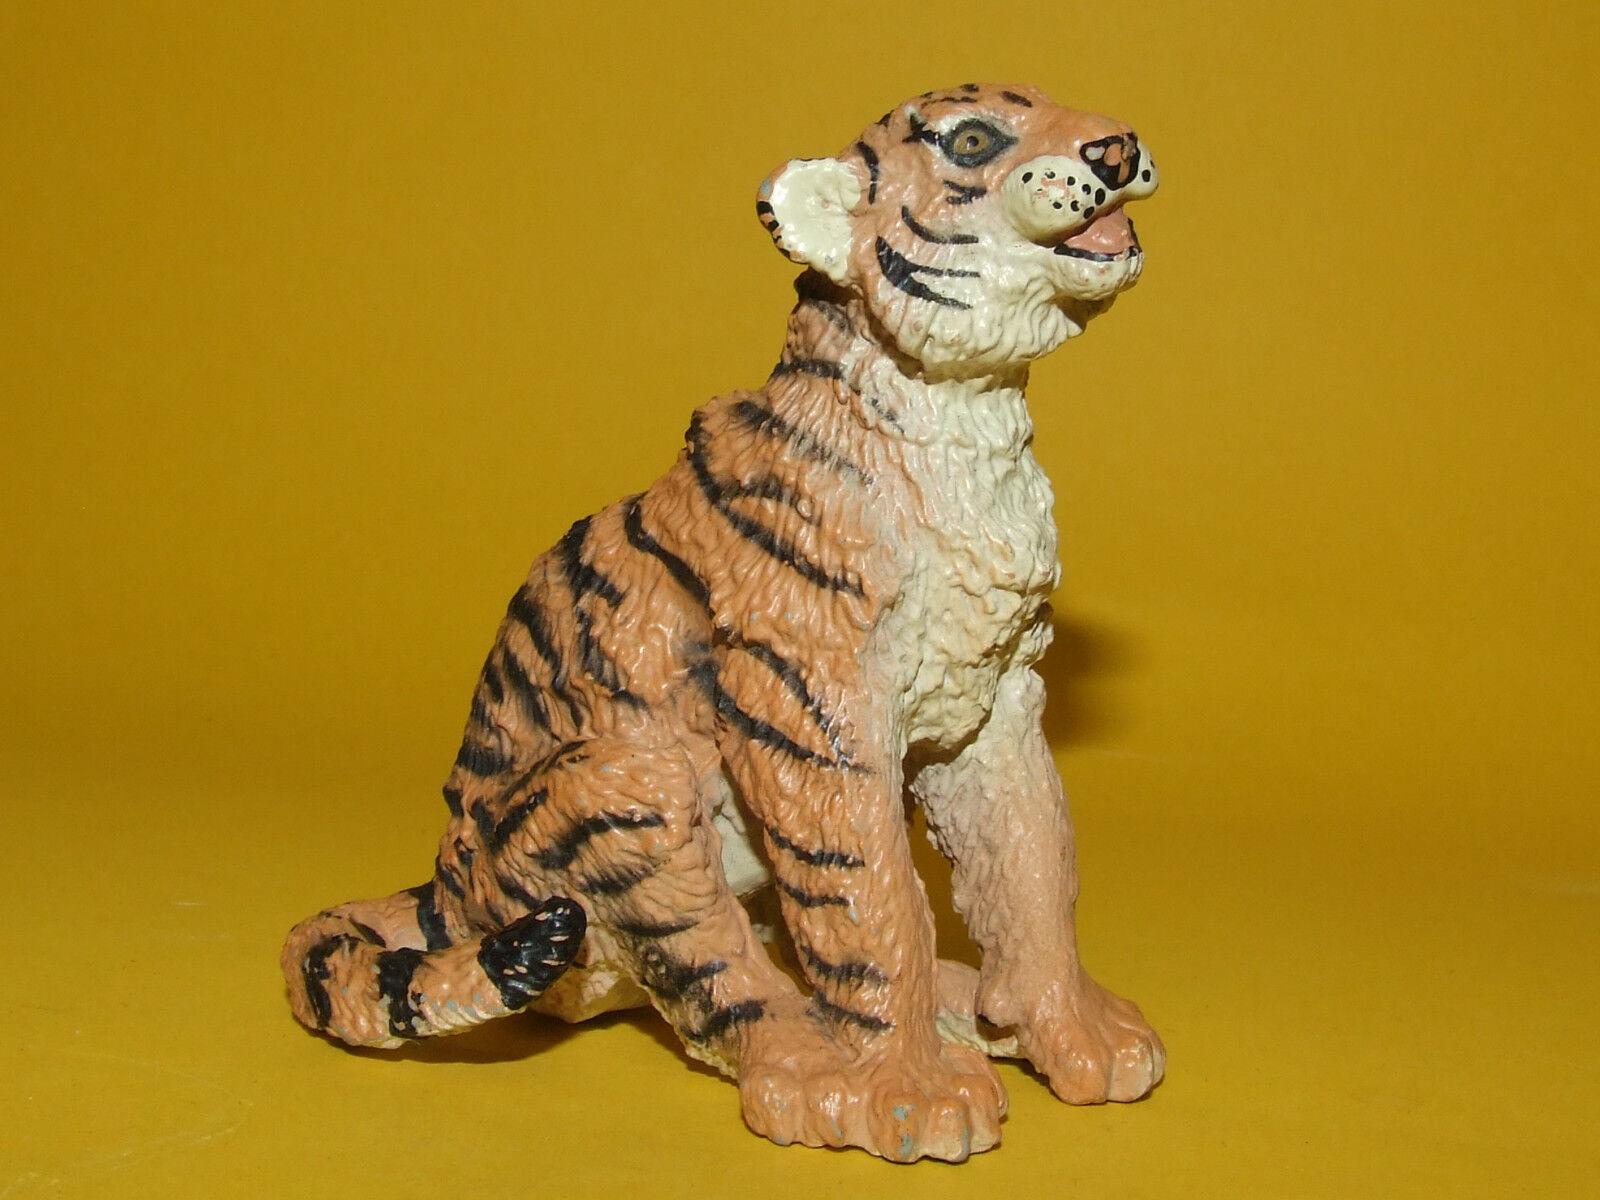 13) Schleich fremdserie Vanishing Wild Safari tigre siberiano bebé 17052